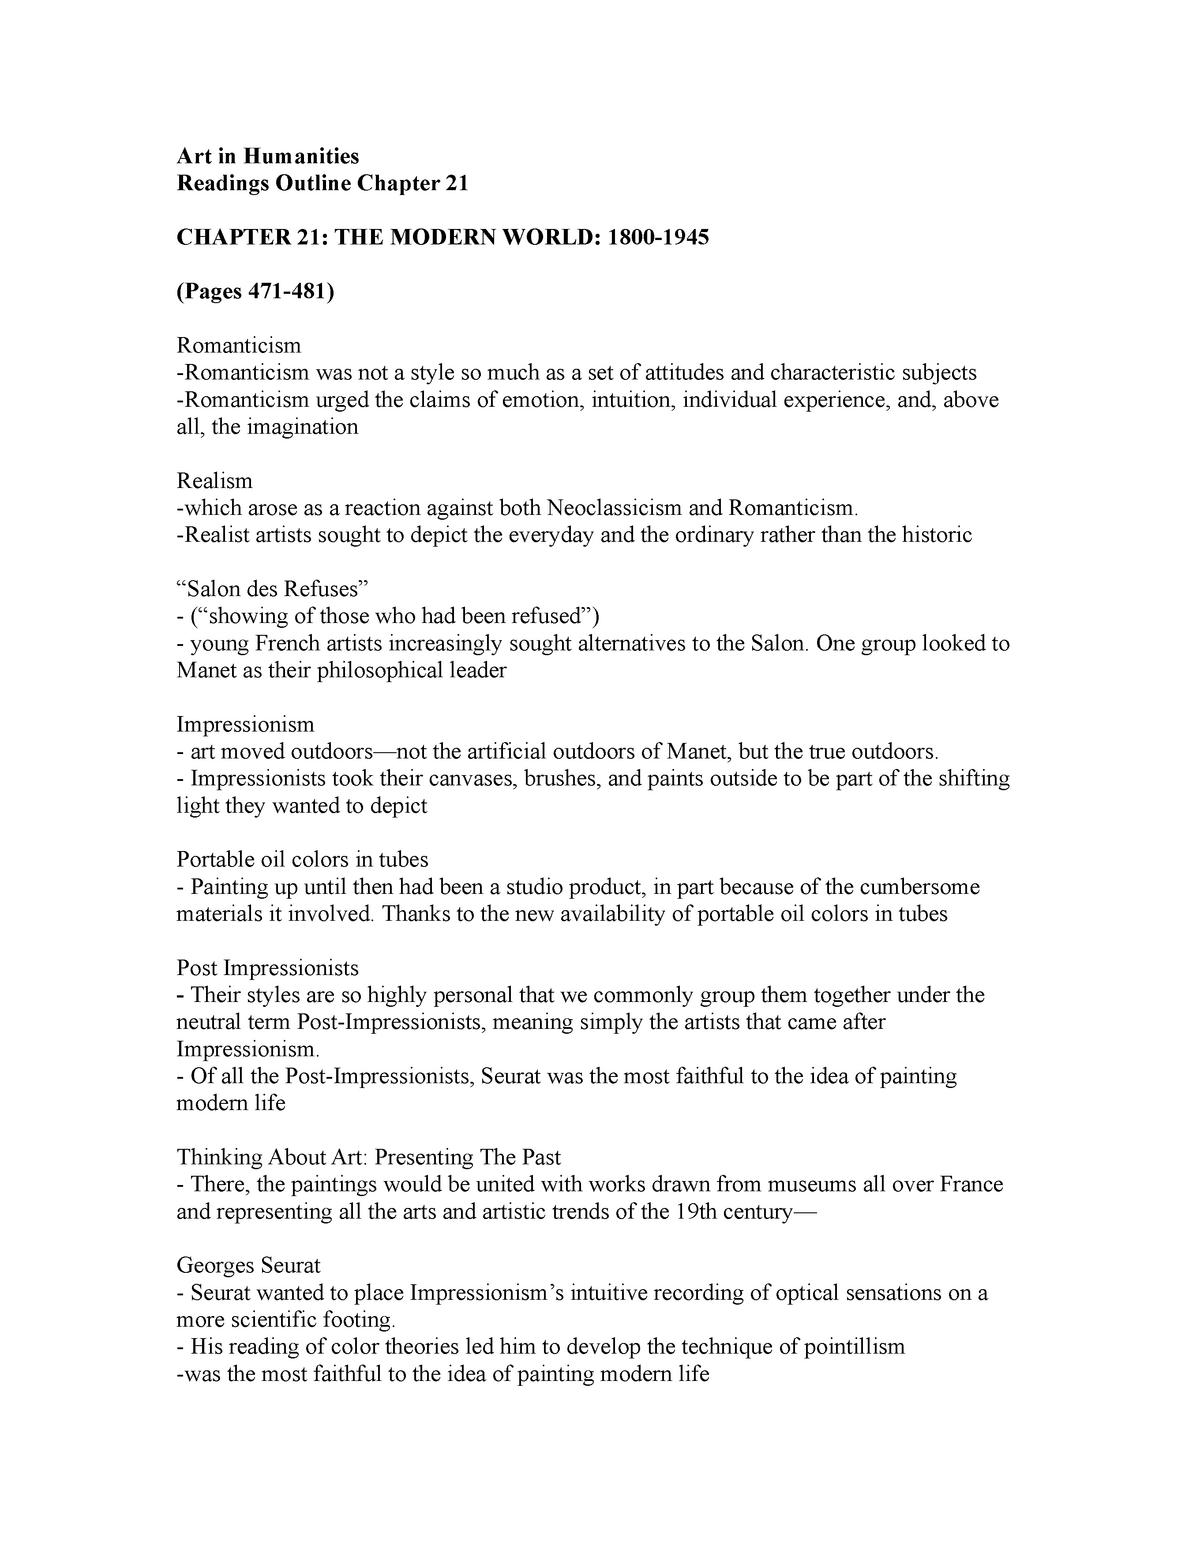 Chapter 21 - Summary World Art - ART 310 - EWU - StuDocu